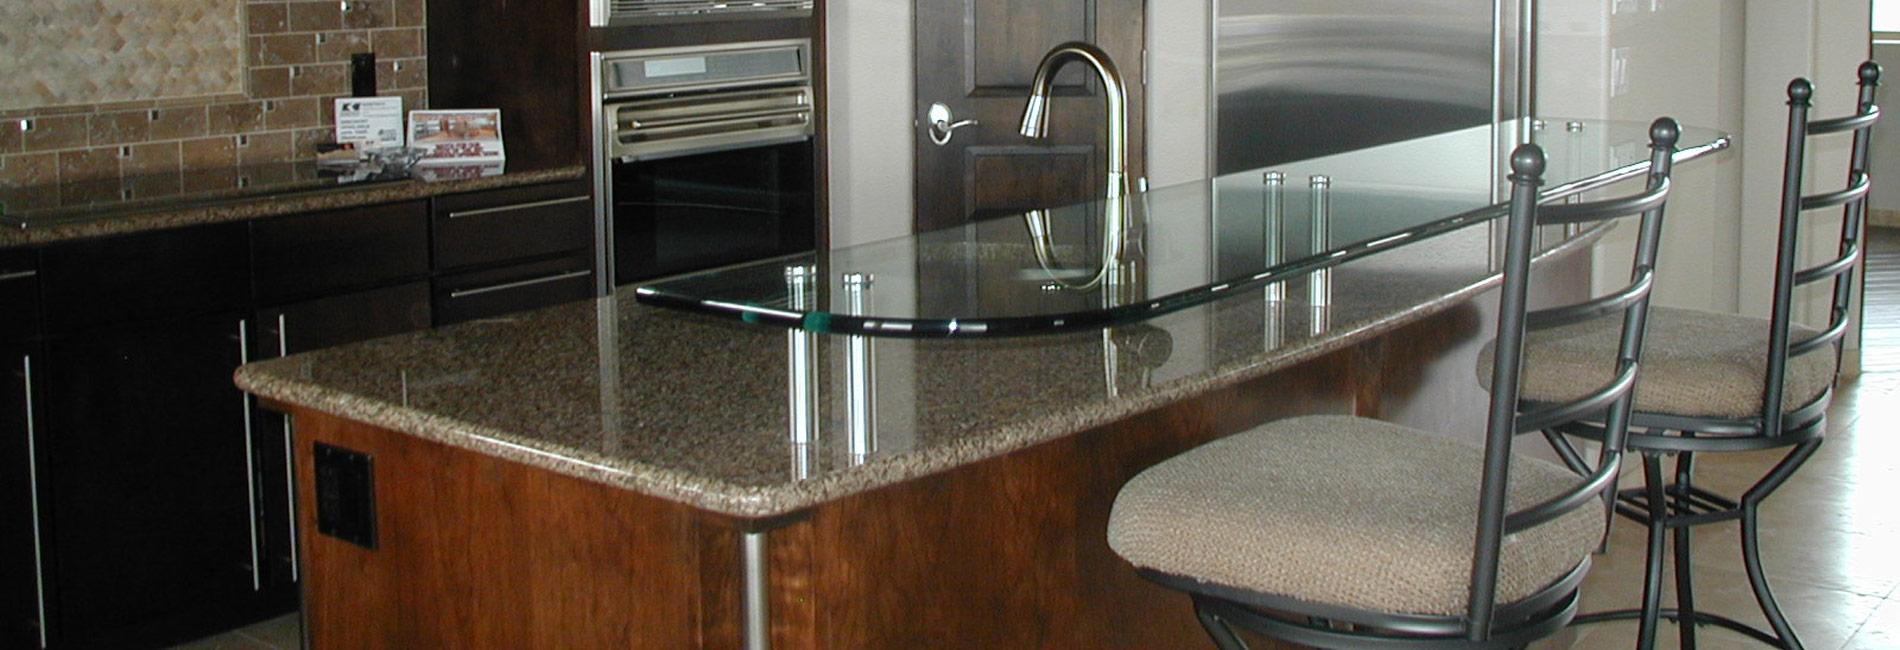 Kitchen Counter Glass Billboard